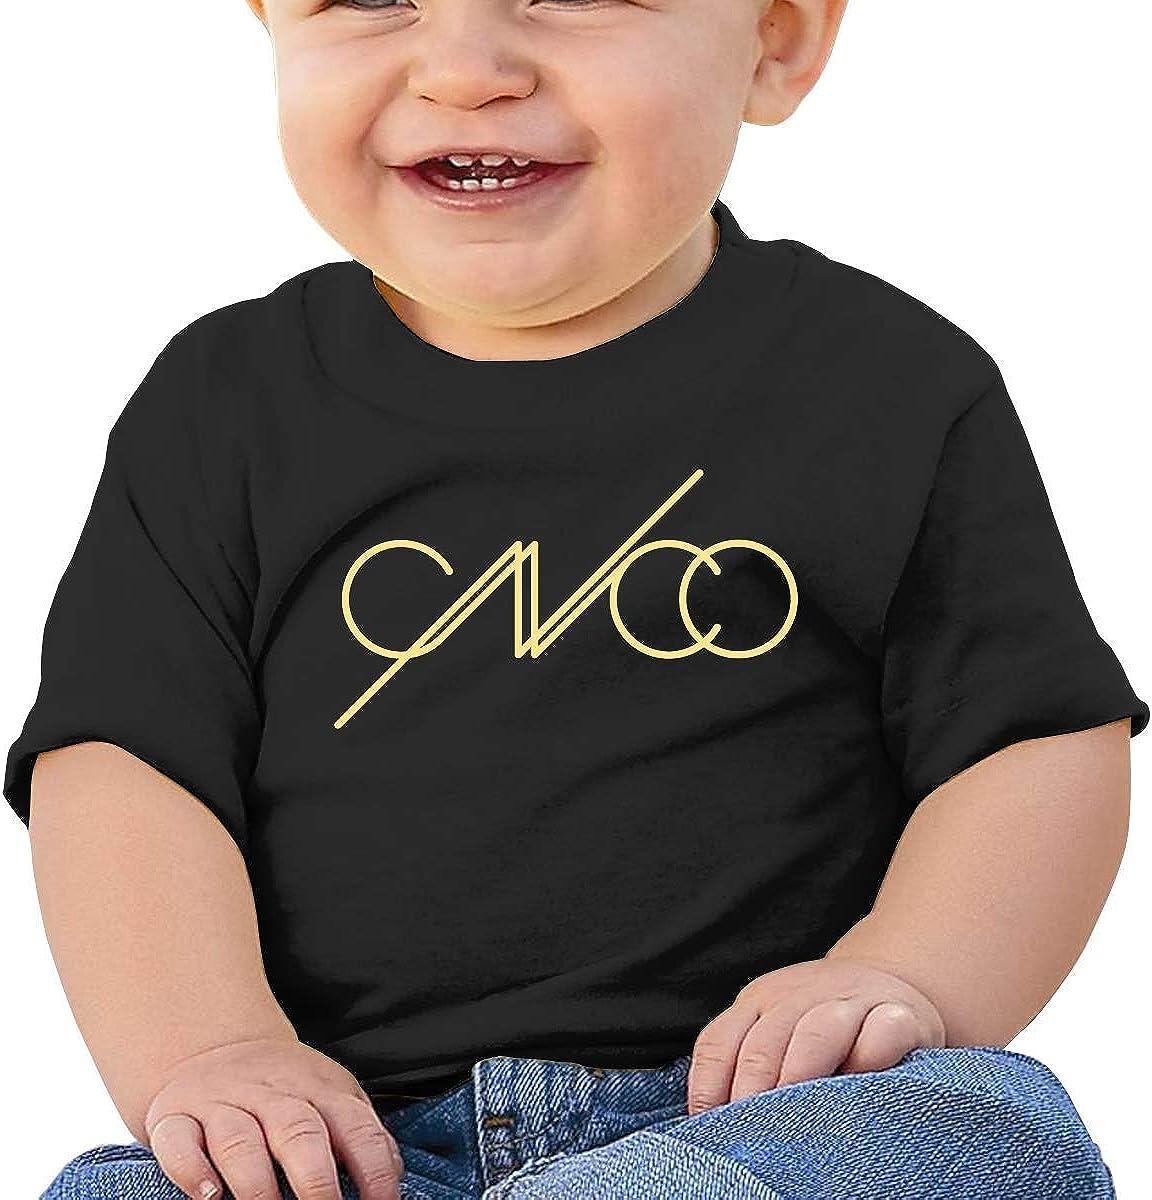 Camiseta de Manga Corta para niños, Cnco Short Sleeve Baby ...